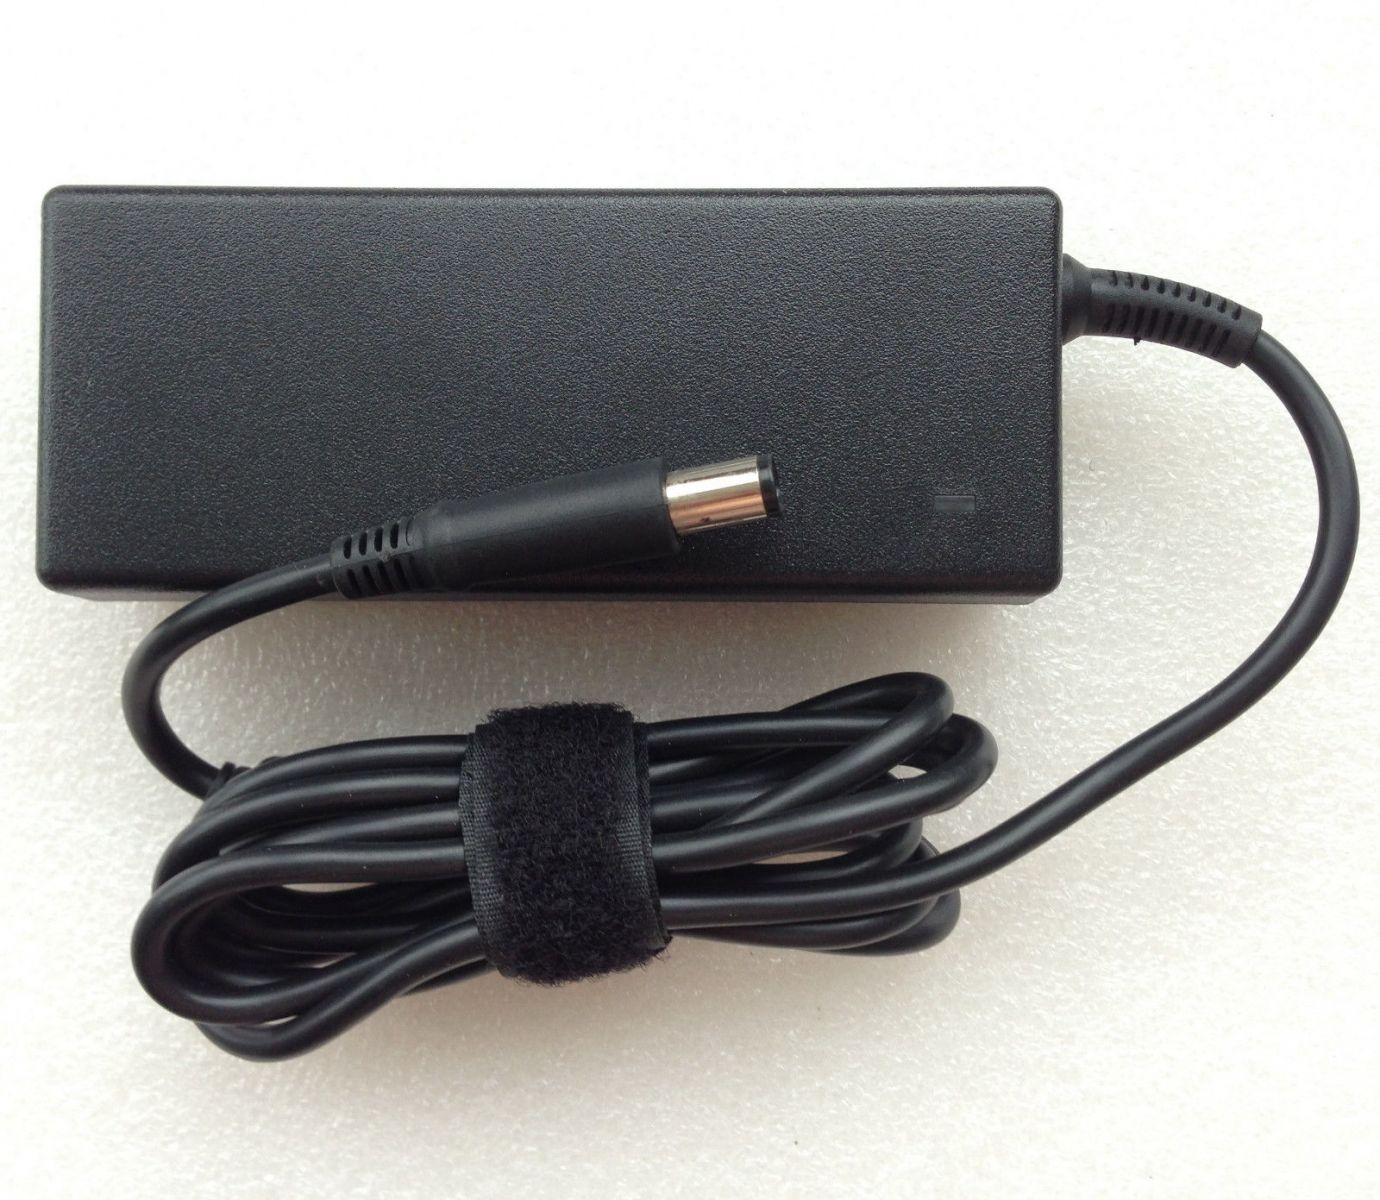 Sạc cho laptop Dell Inspiron 14 3437, 14R 5437 Adapter  19.5V-3.34A